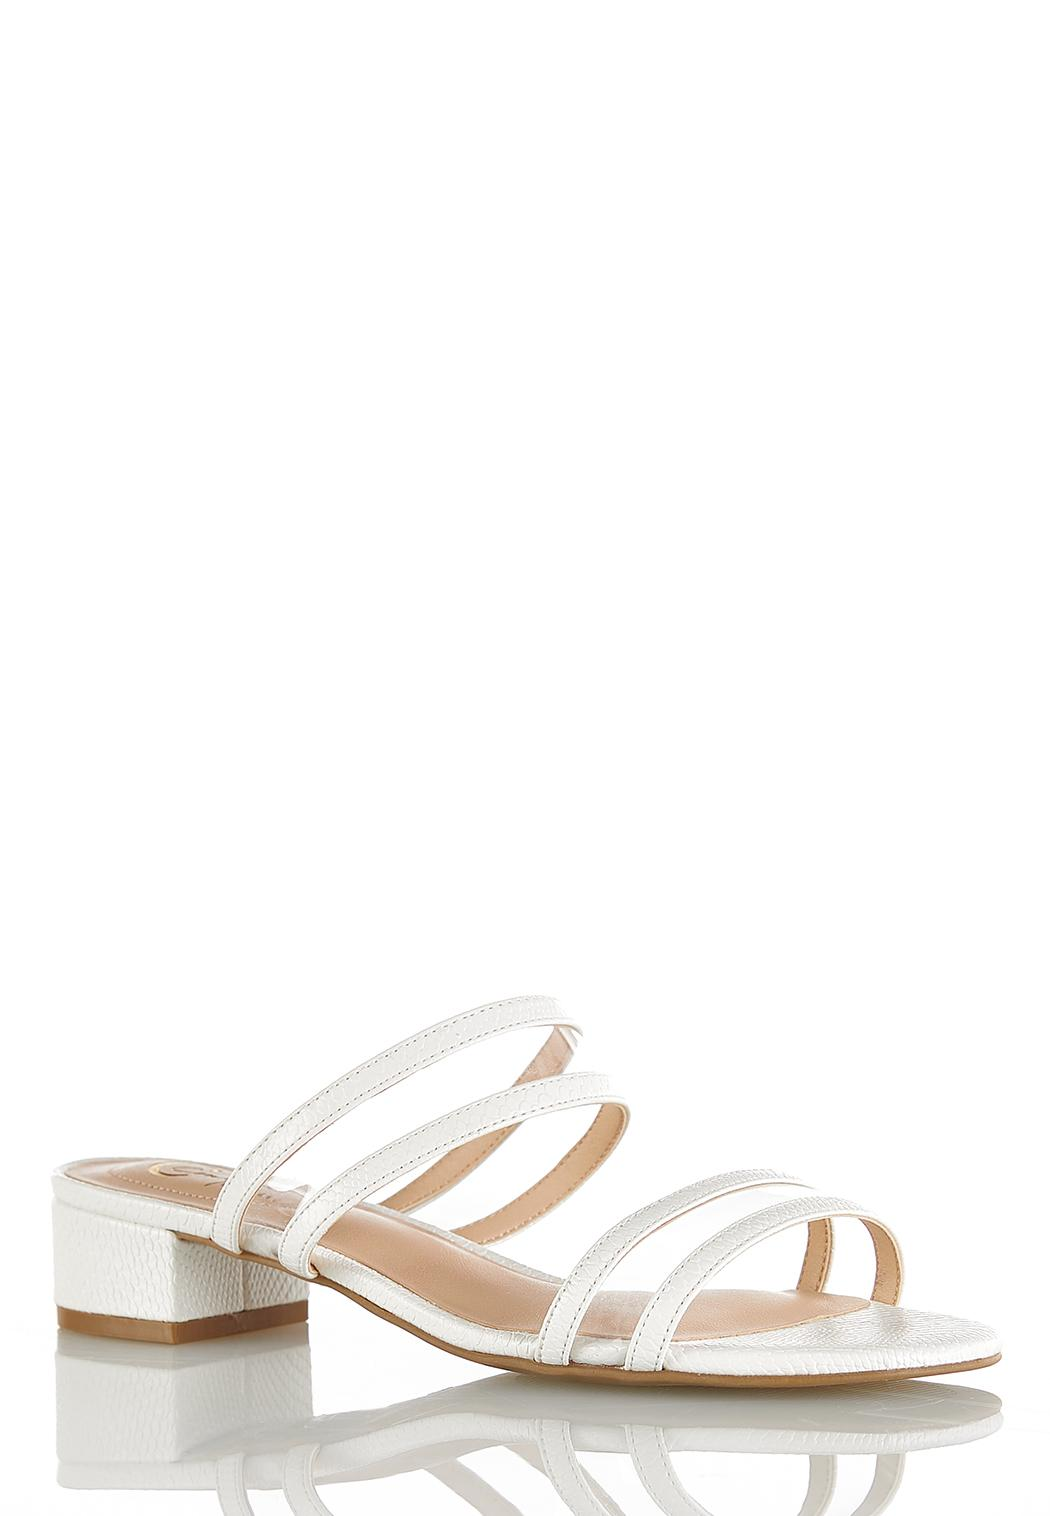 Lucite Strap Sandals